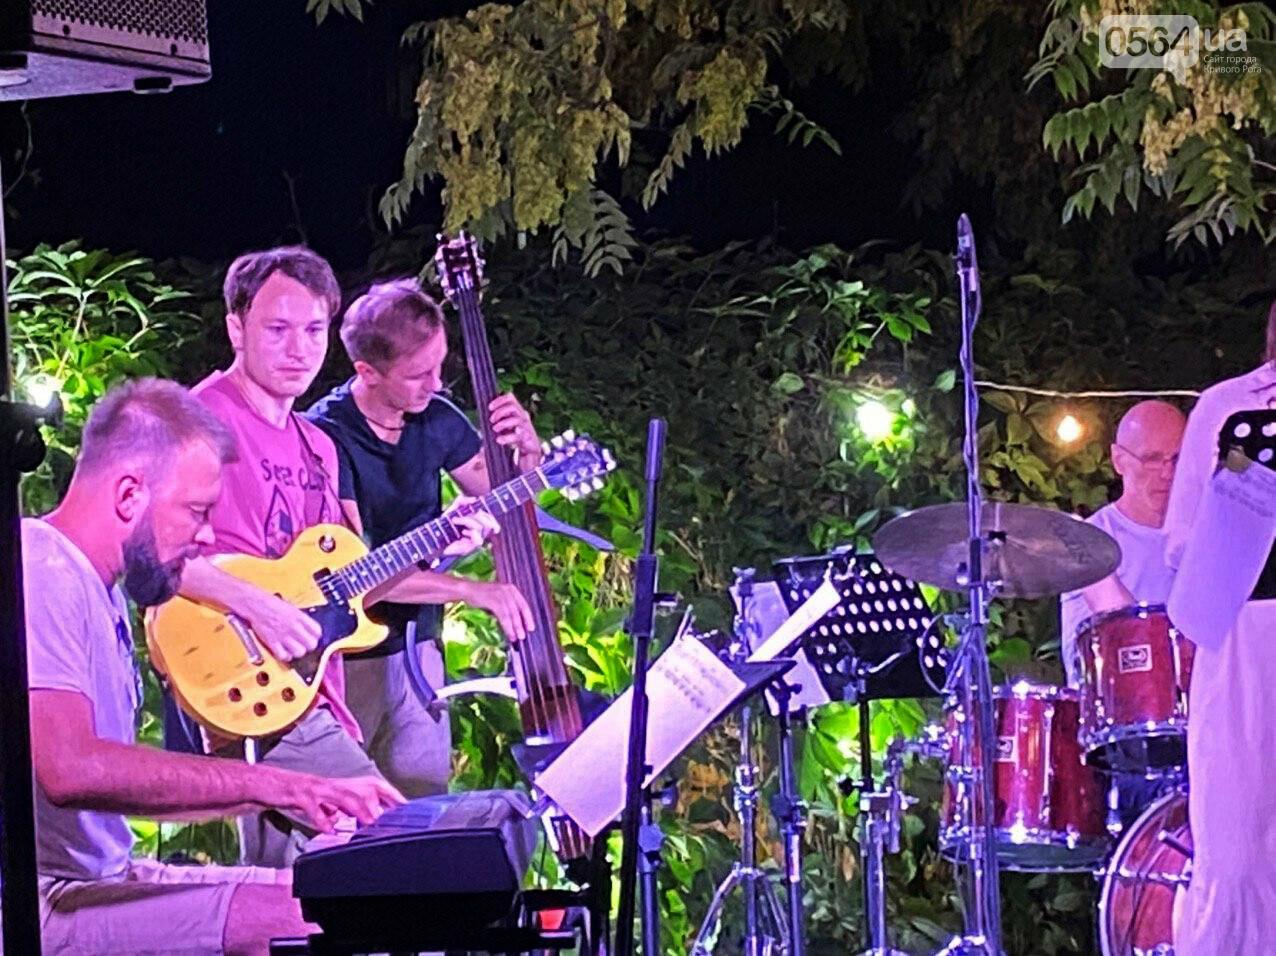 Под звездным небом криворожане наслаждались летним джазом от  Advantage Project, - ФОТО, ВИДЕО , фото-65